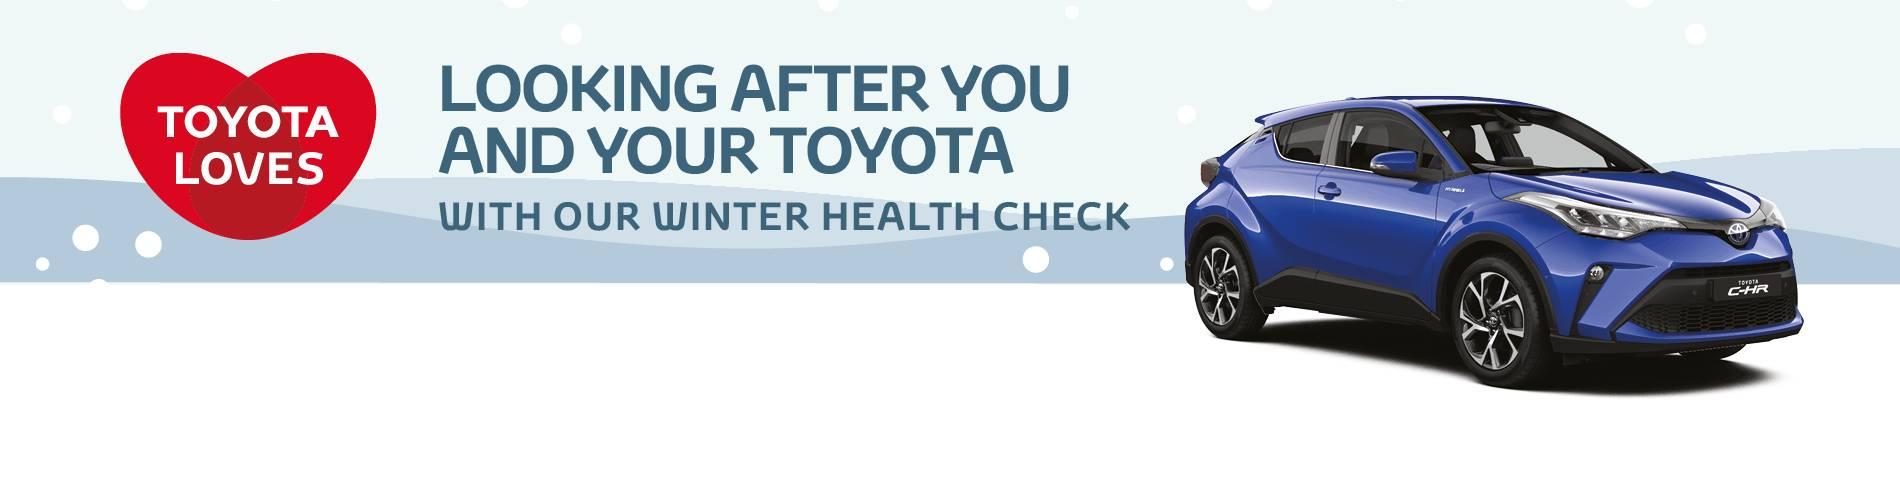 Toyota Winter Check